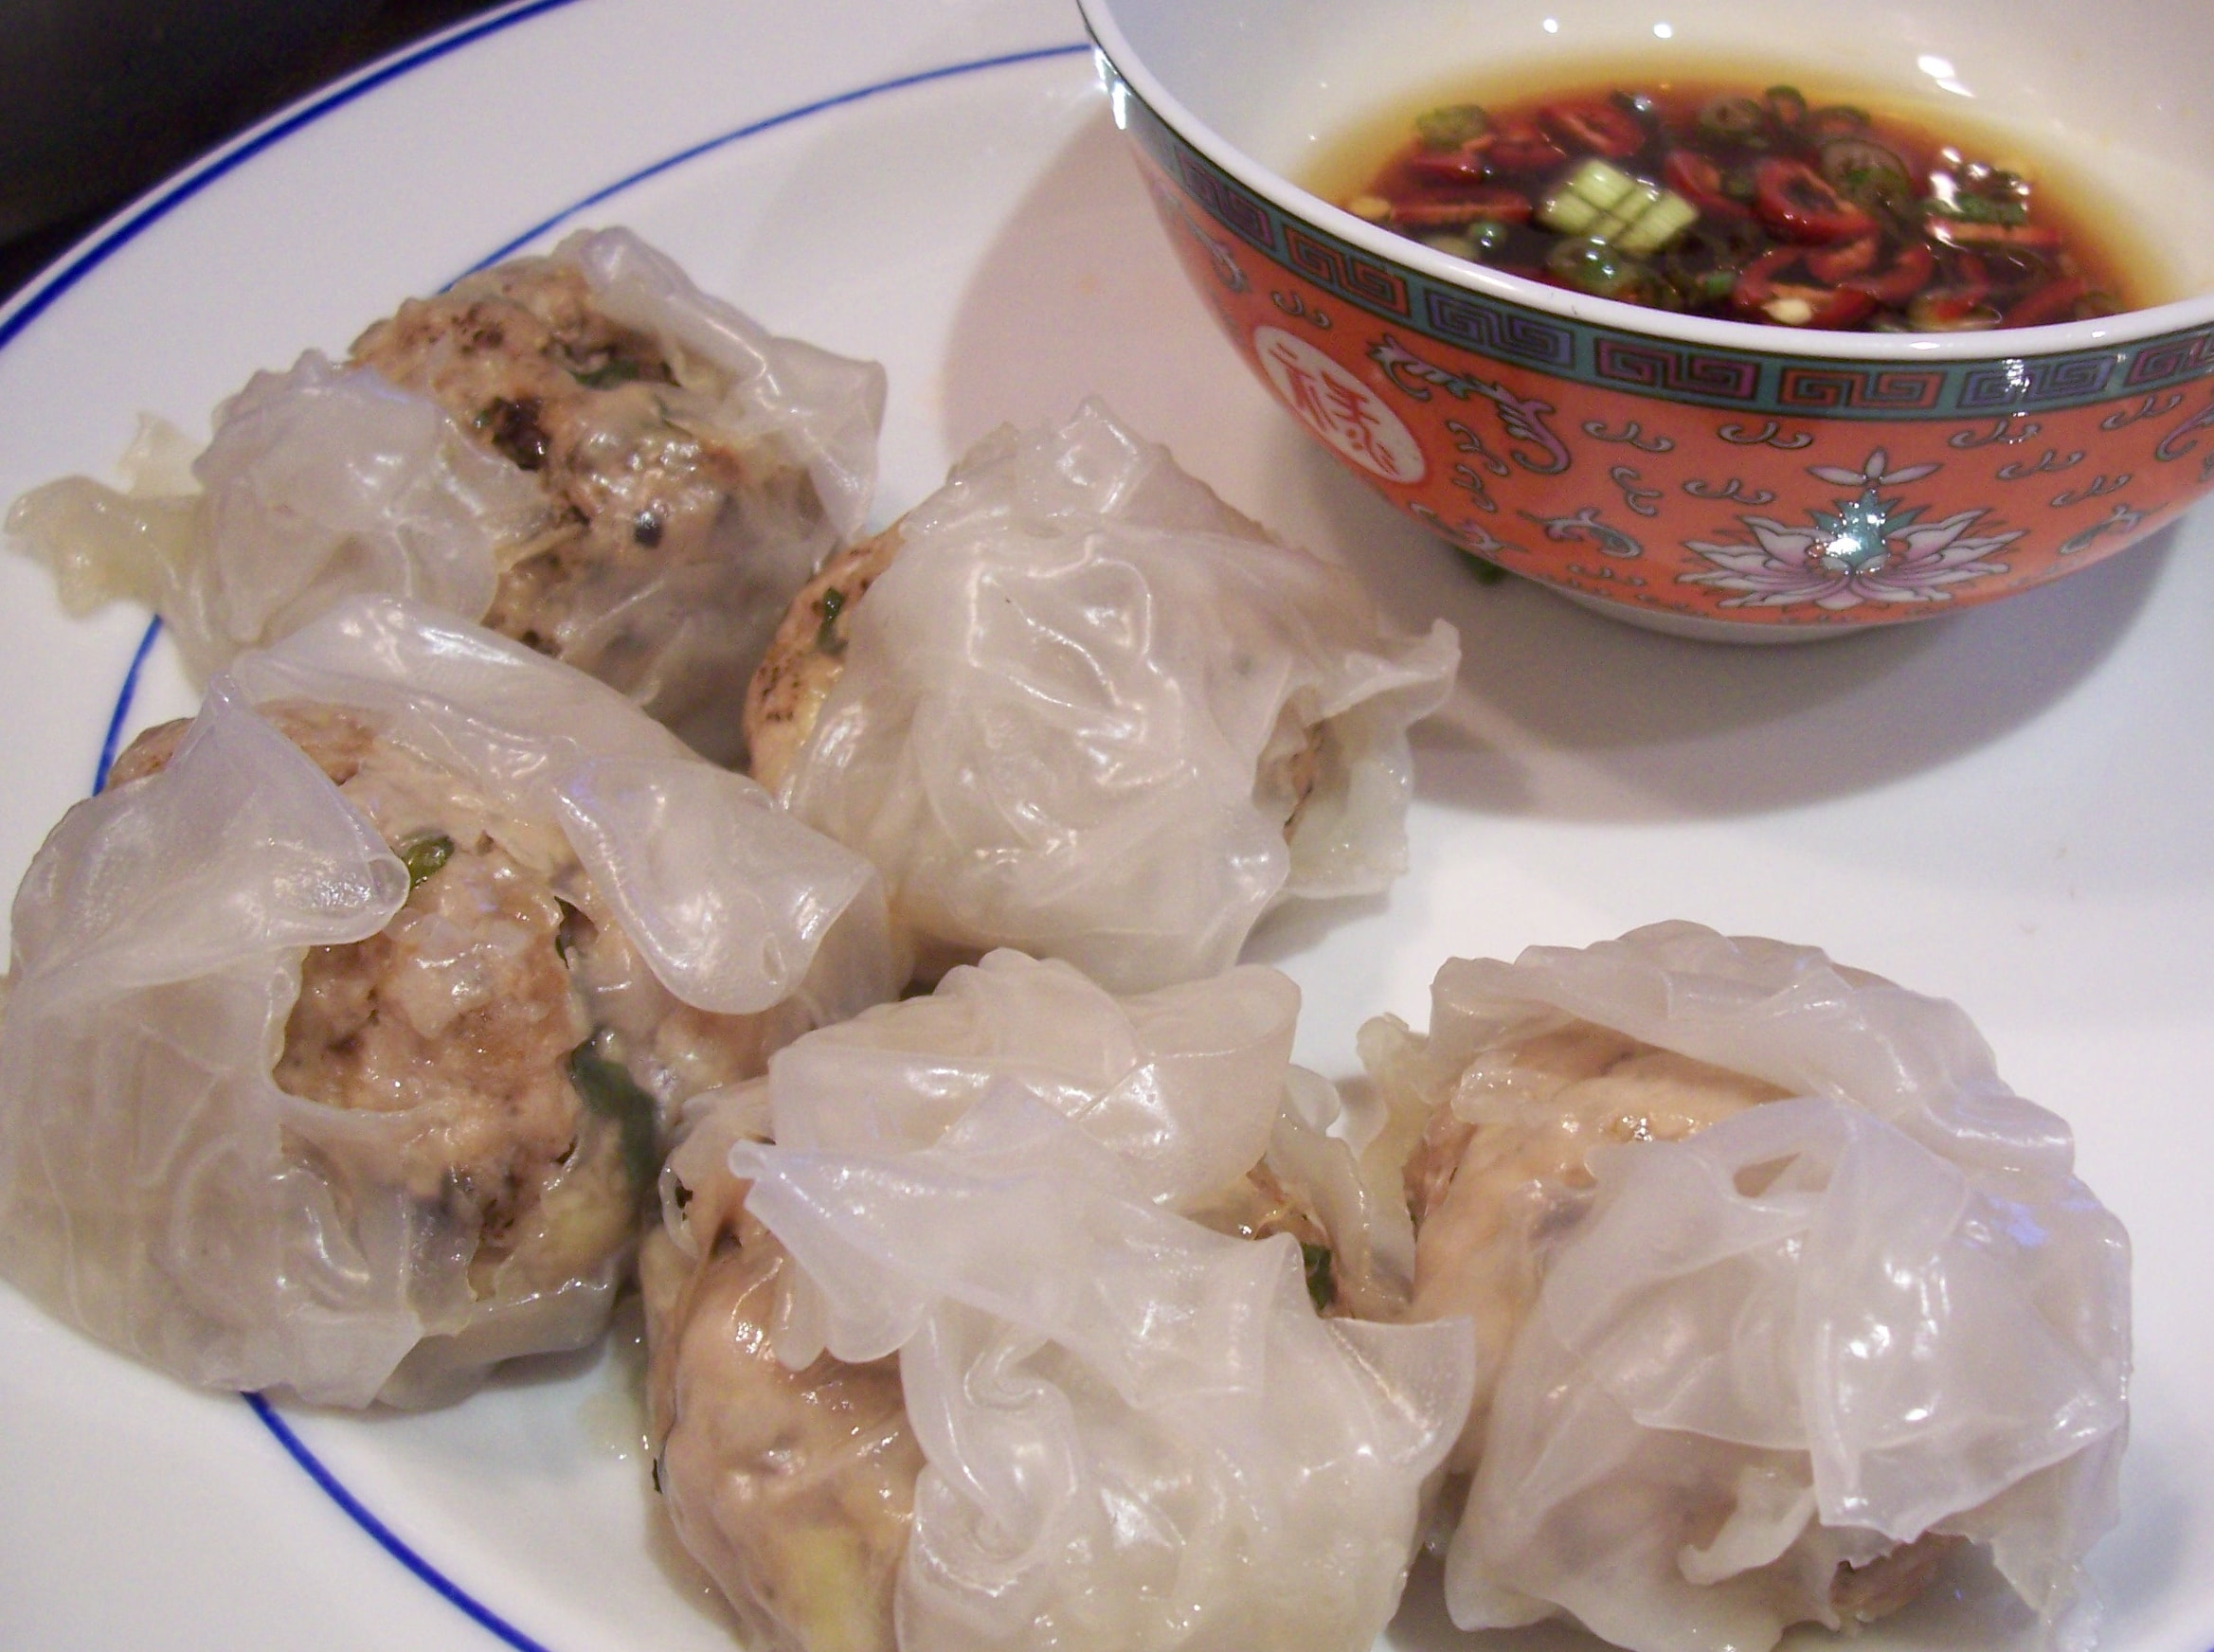 Steamed pork dumplings with a dipping sauce